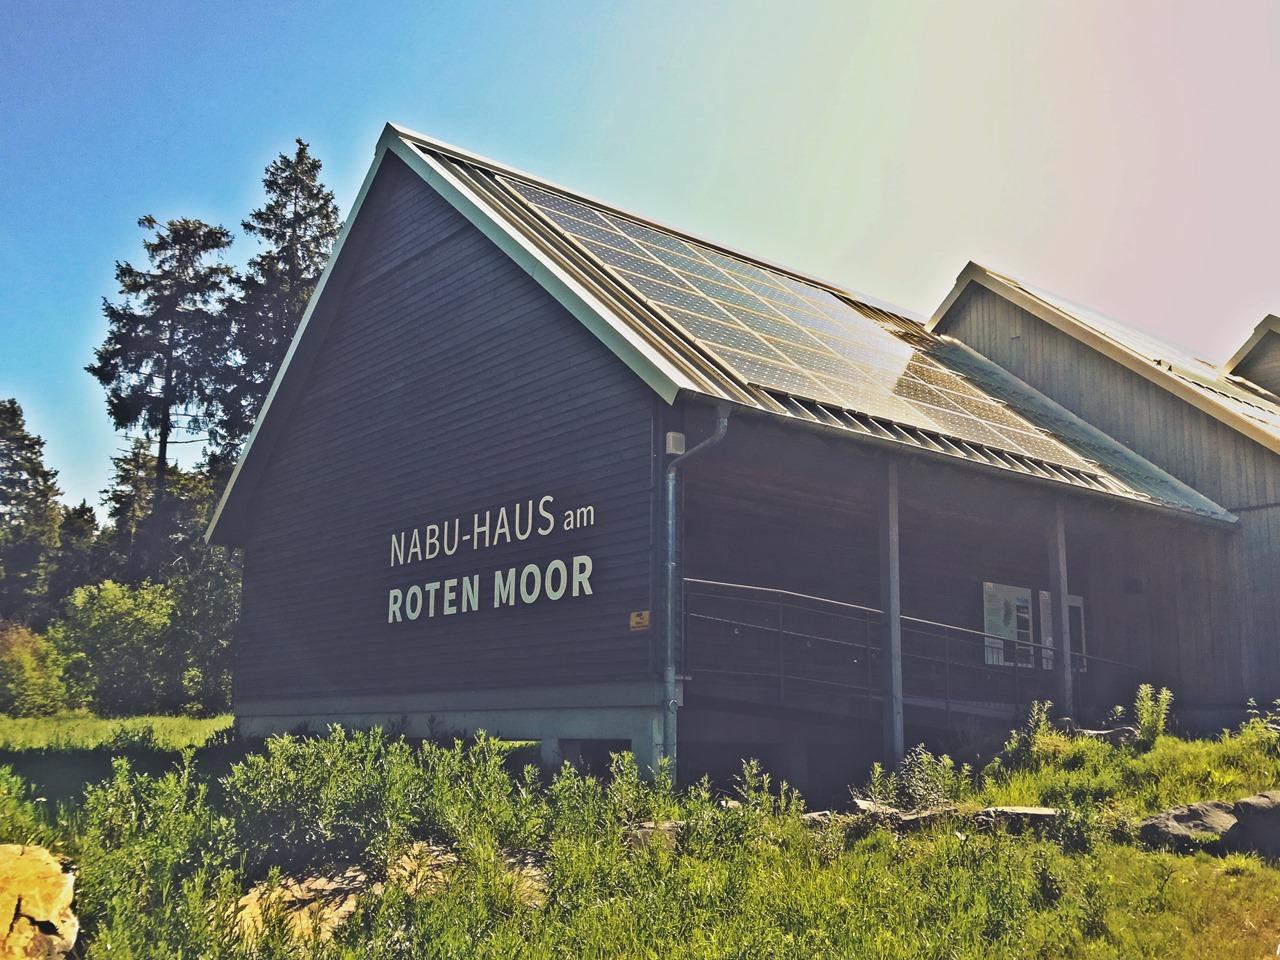 NABU Haus am Roten Moor